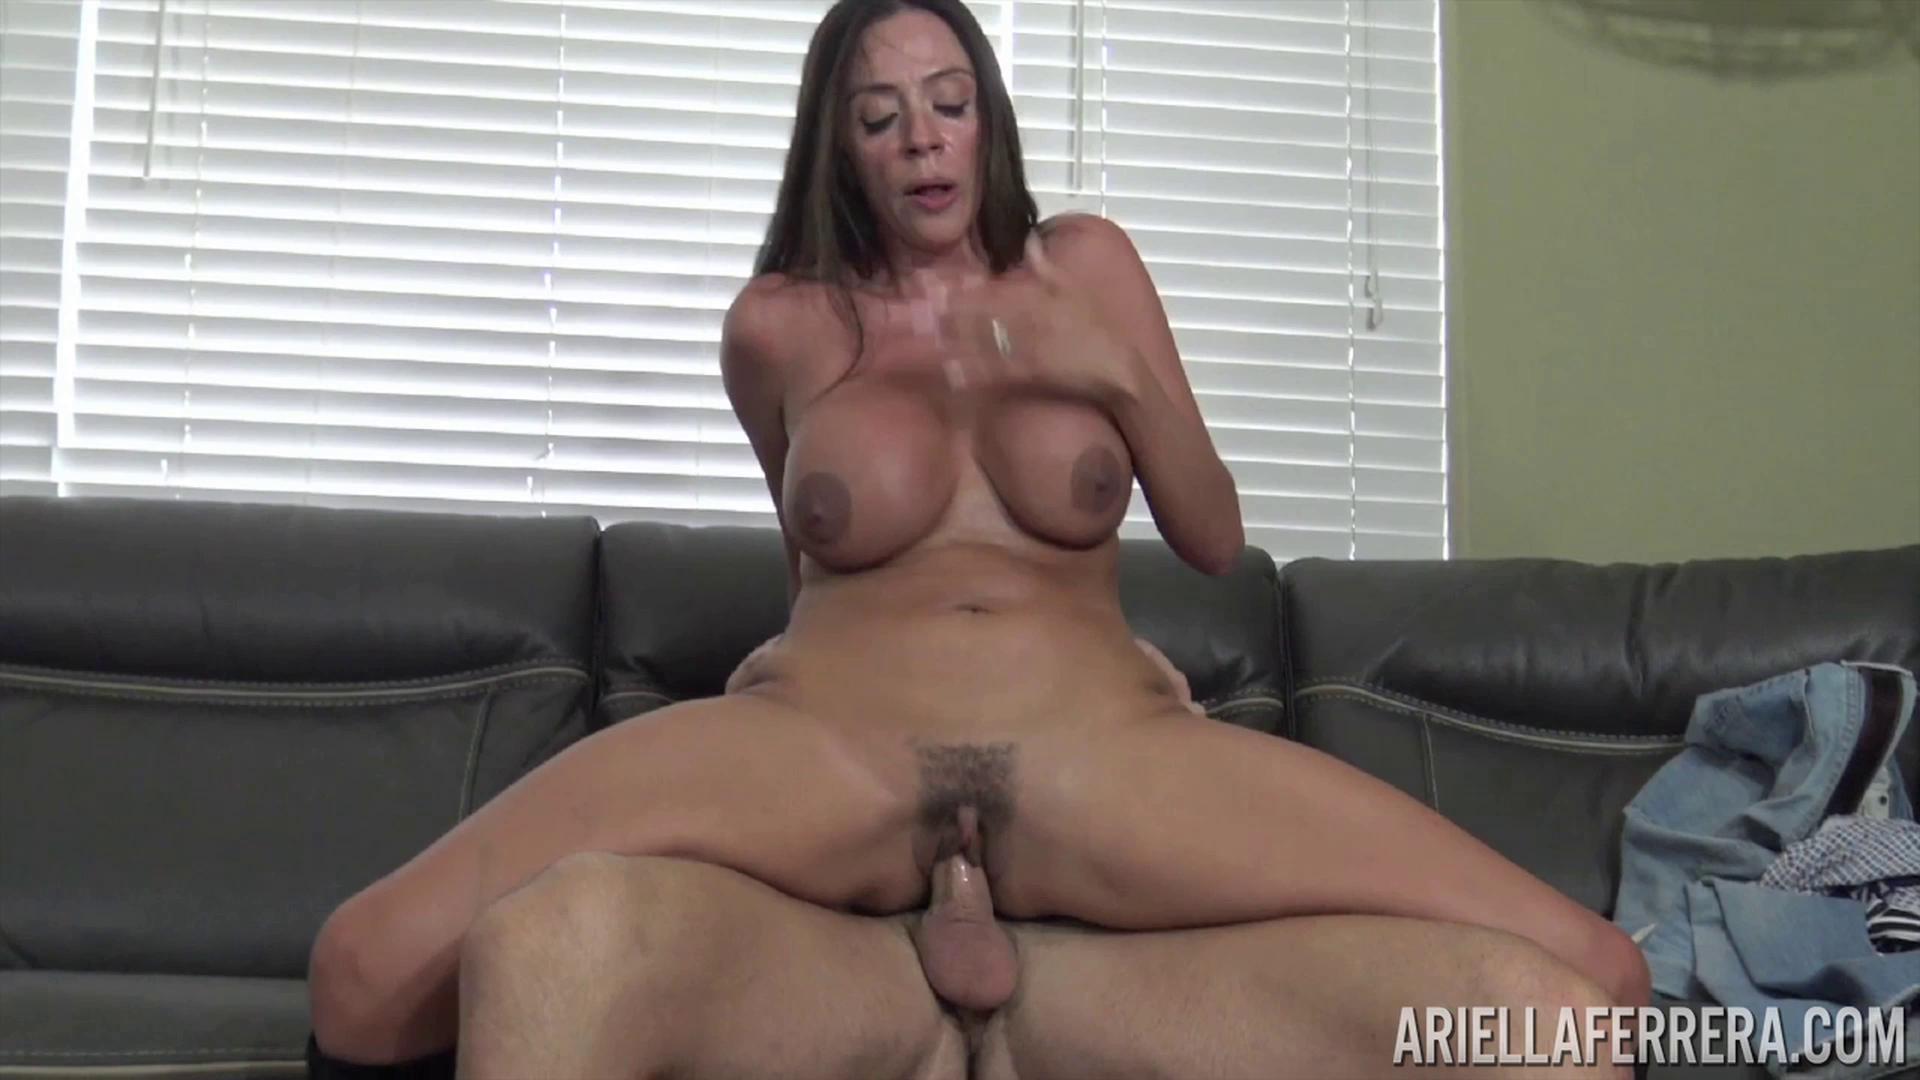 PornstarPlatinum – Ariella Ferrera Casting Couch Coochie